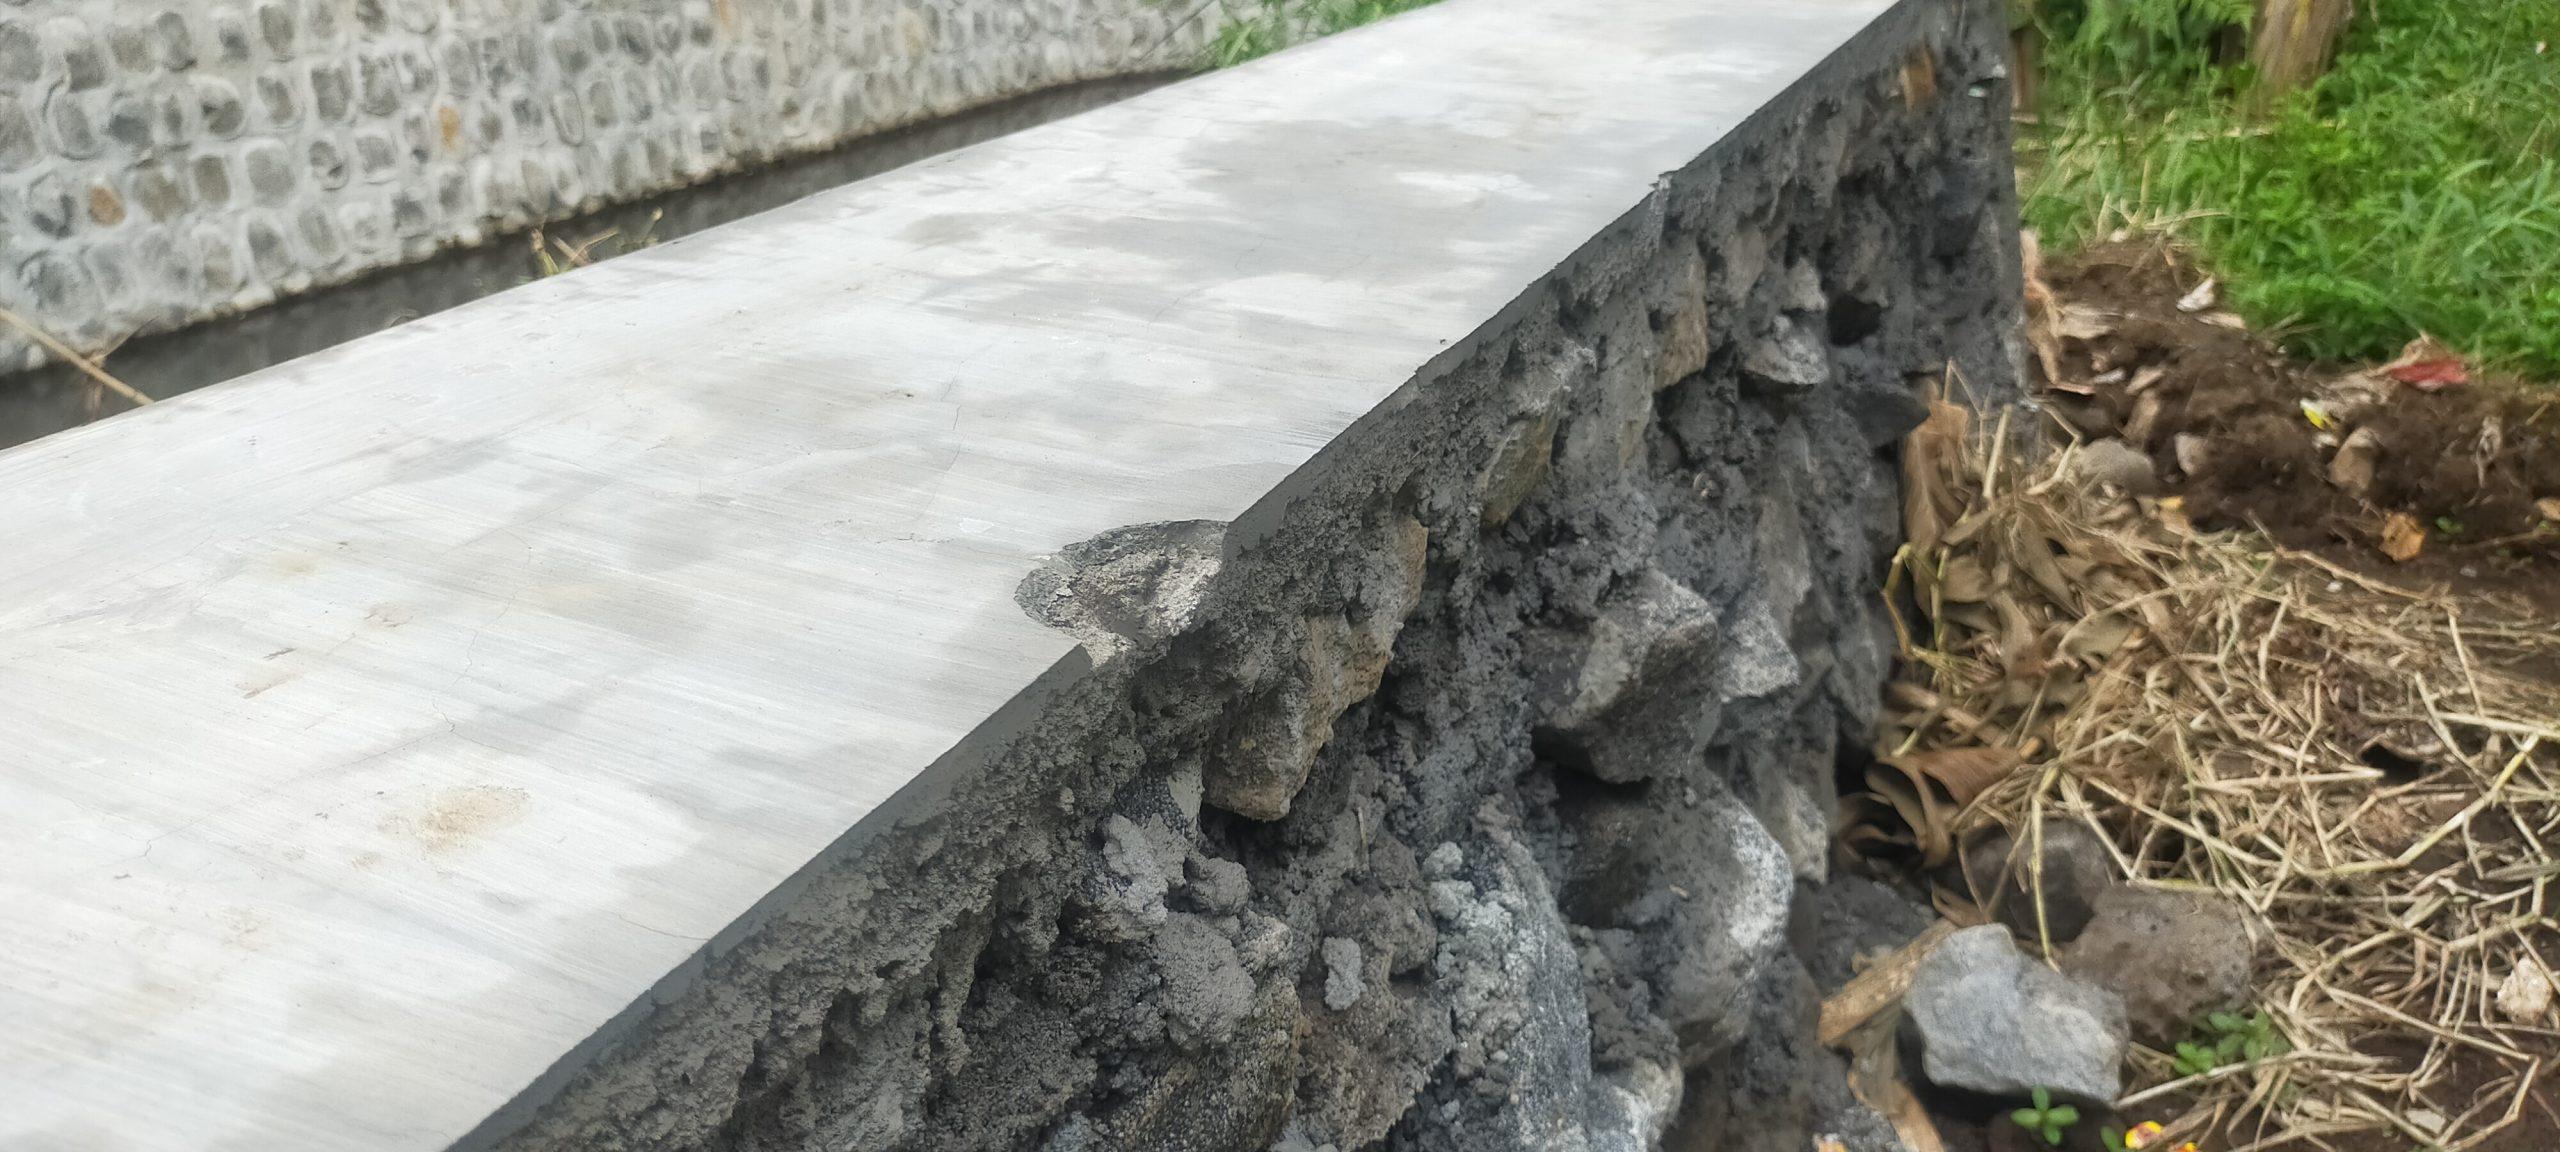 Ilustrasi Salah Satu Proyek Infrastruktur Pengairan Kabupaten Malang 2021